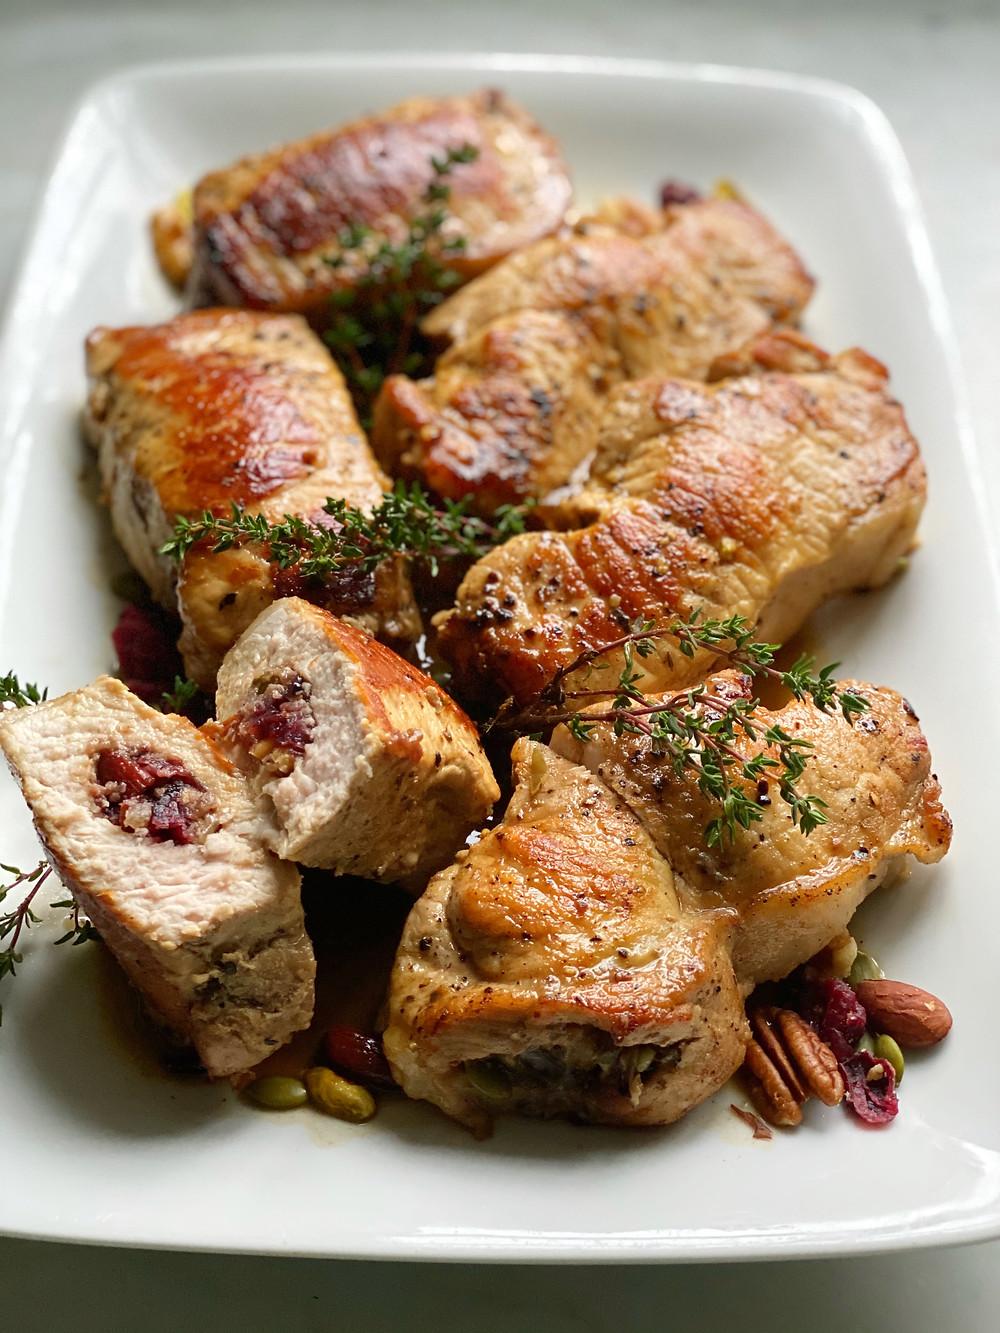 Apple-Almond-Brie Stuffed Chicken Breasts